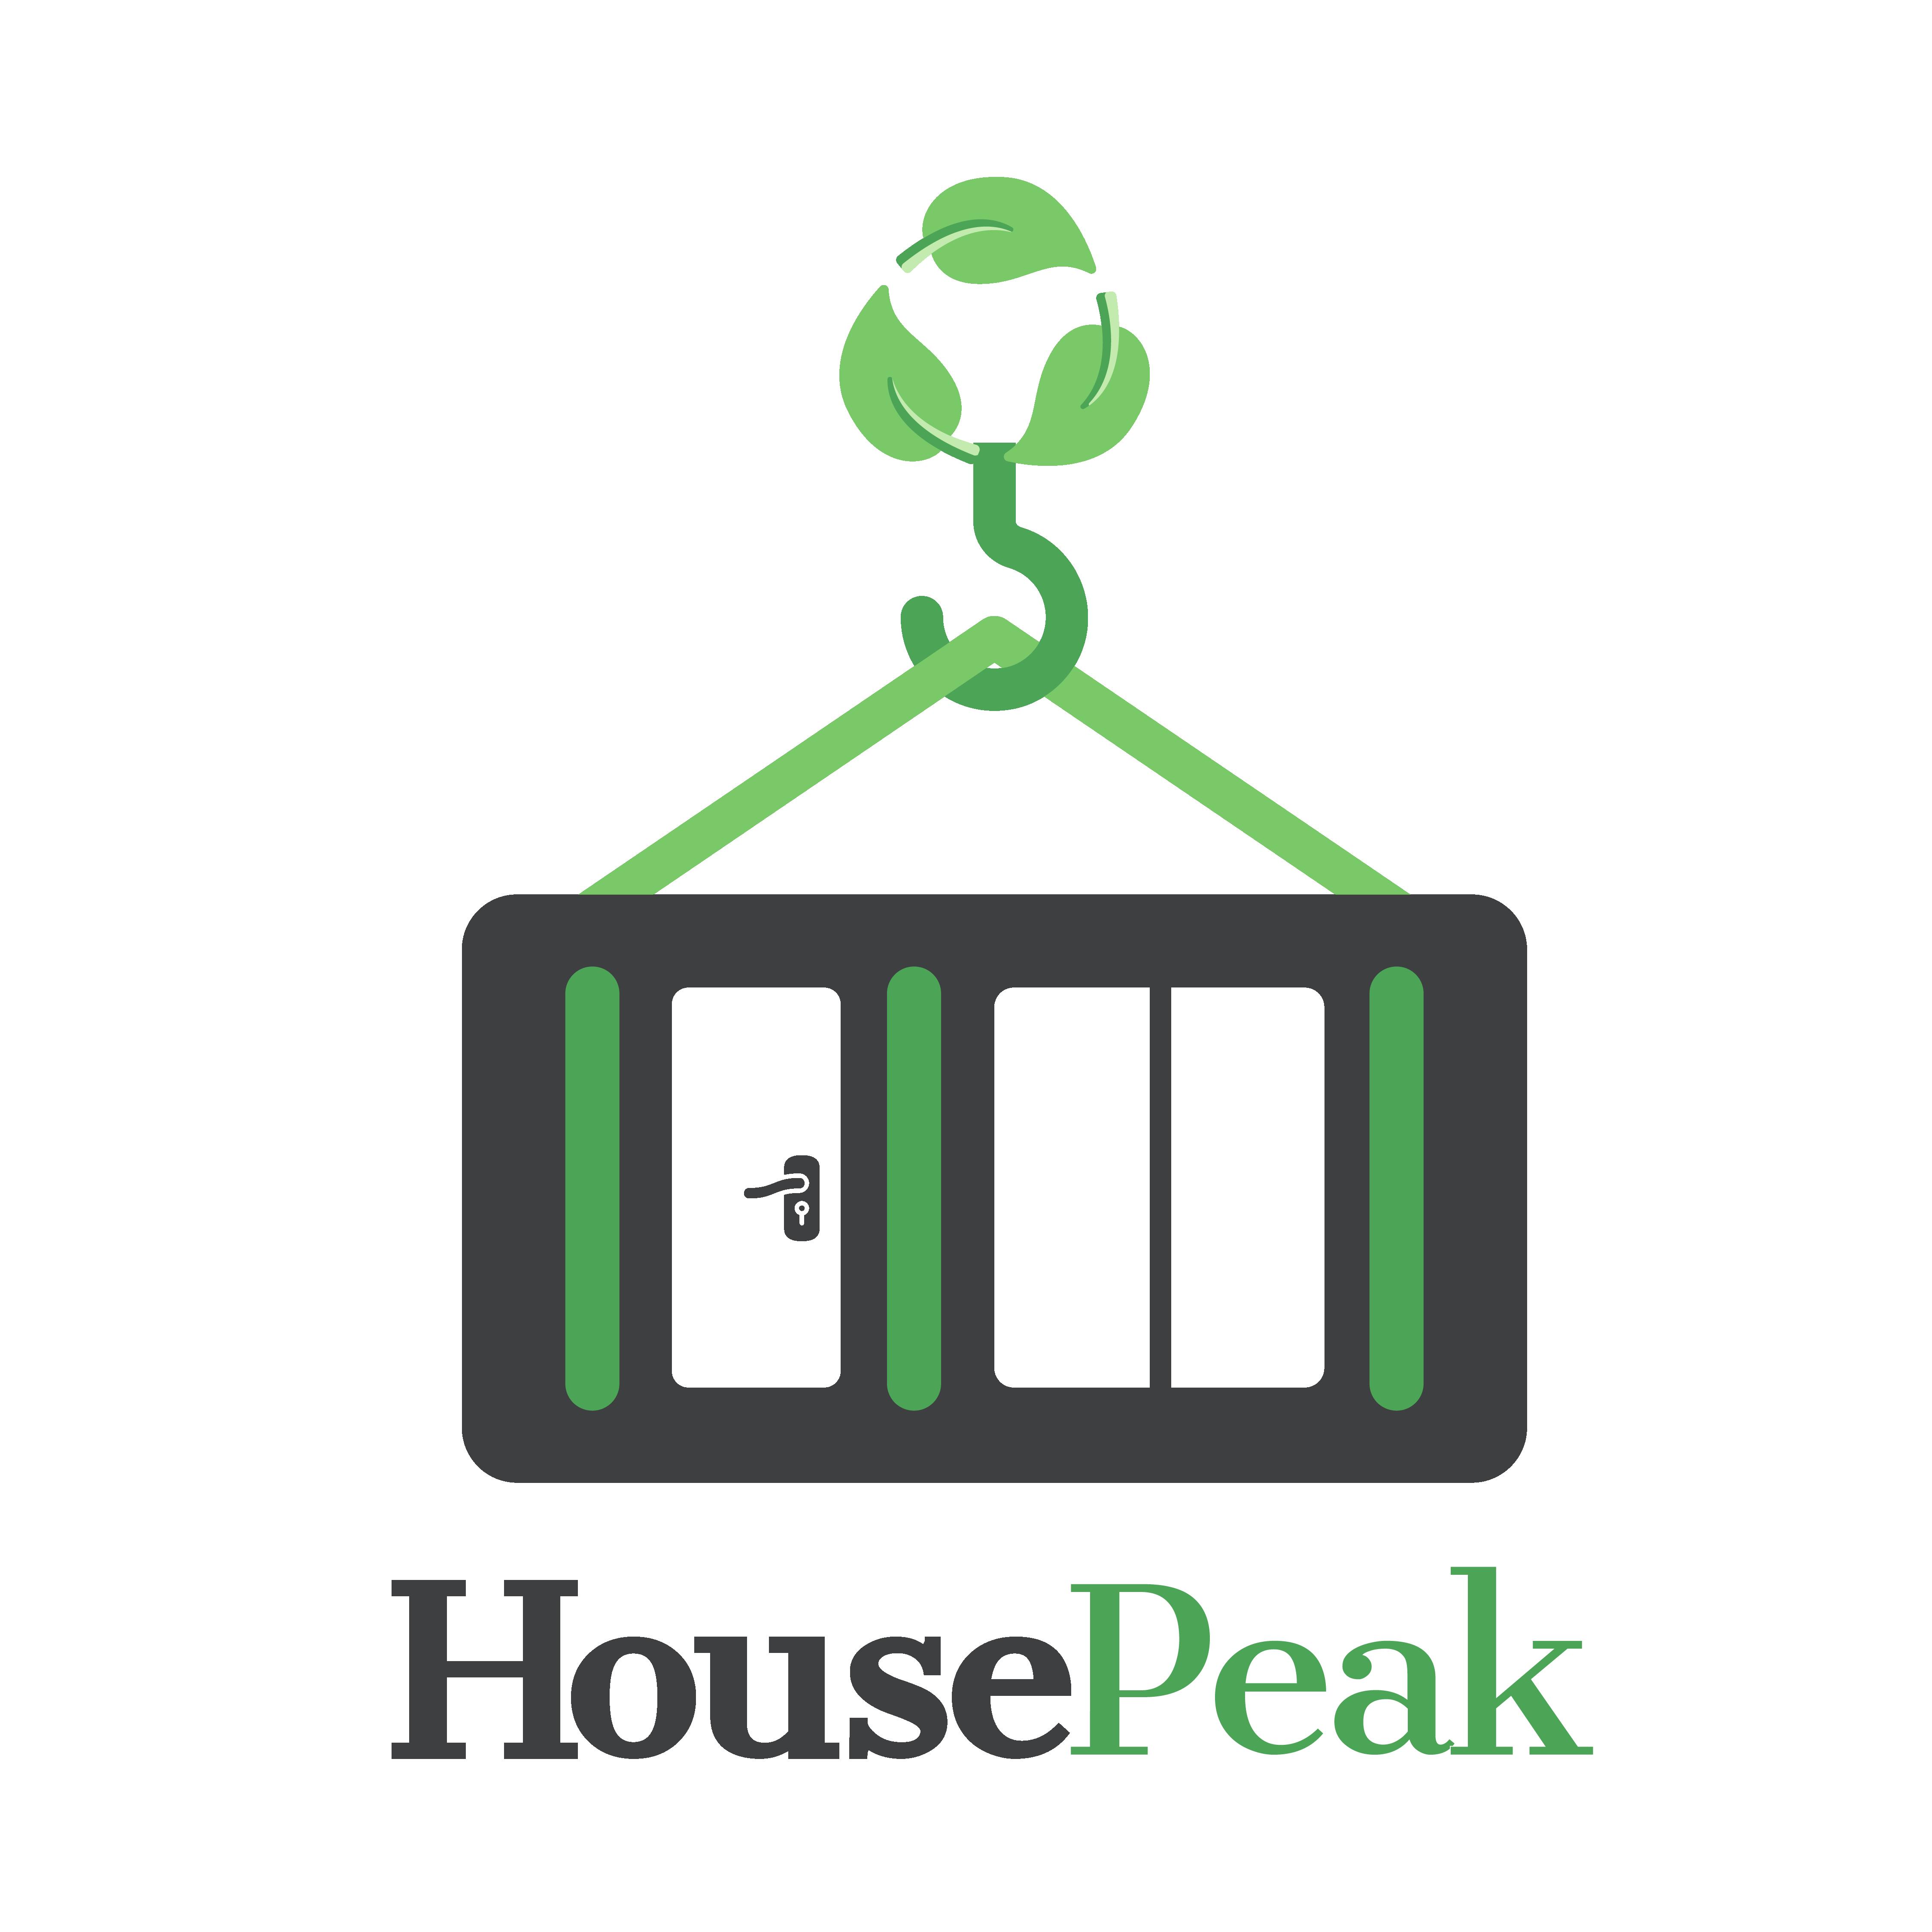 Housepeak